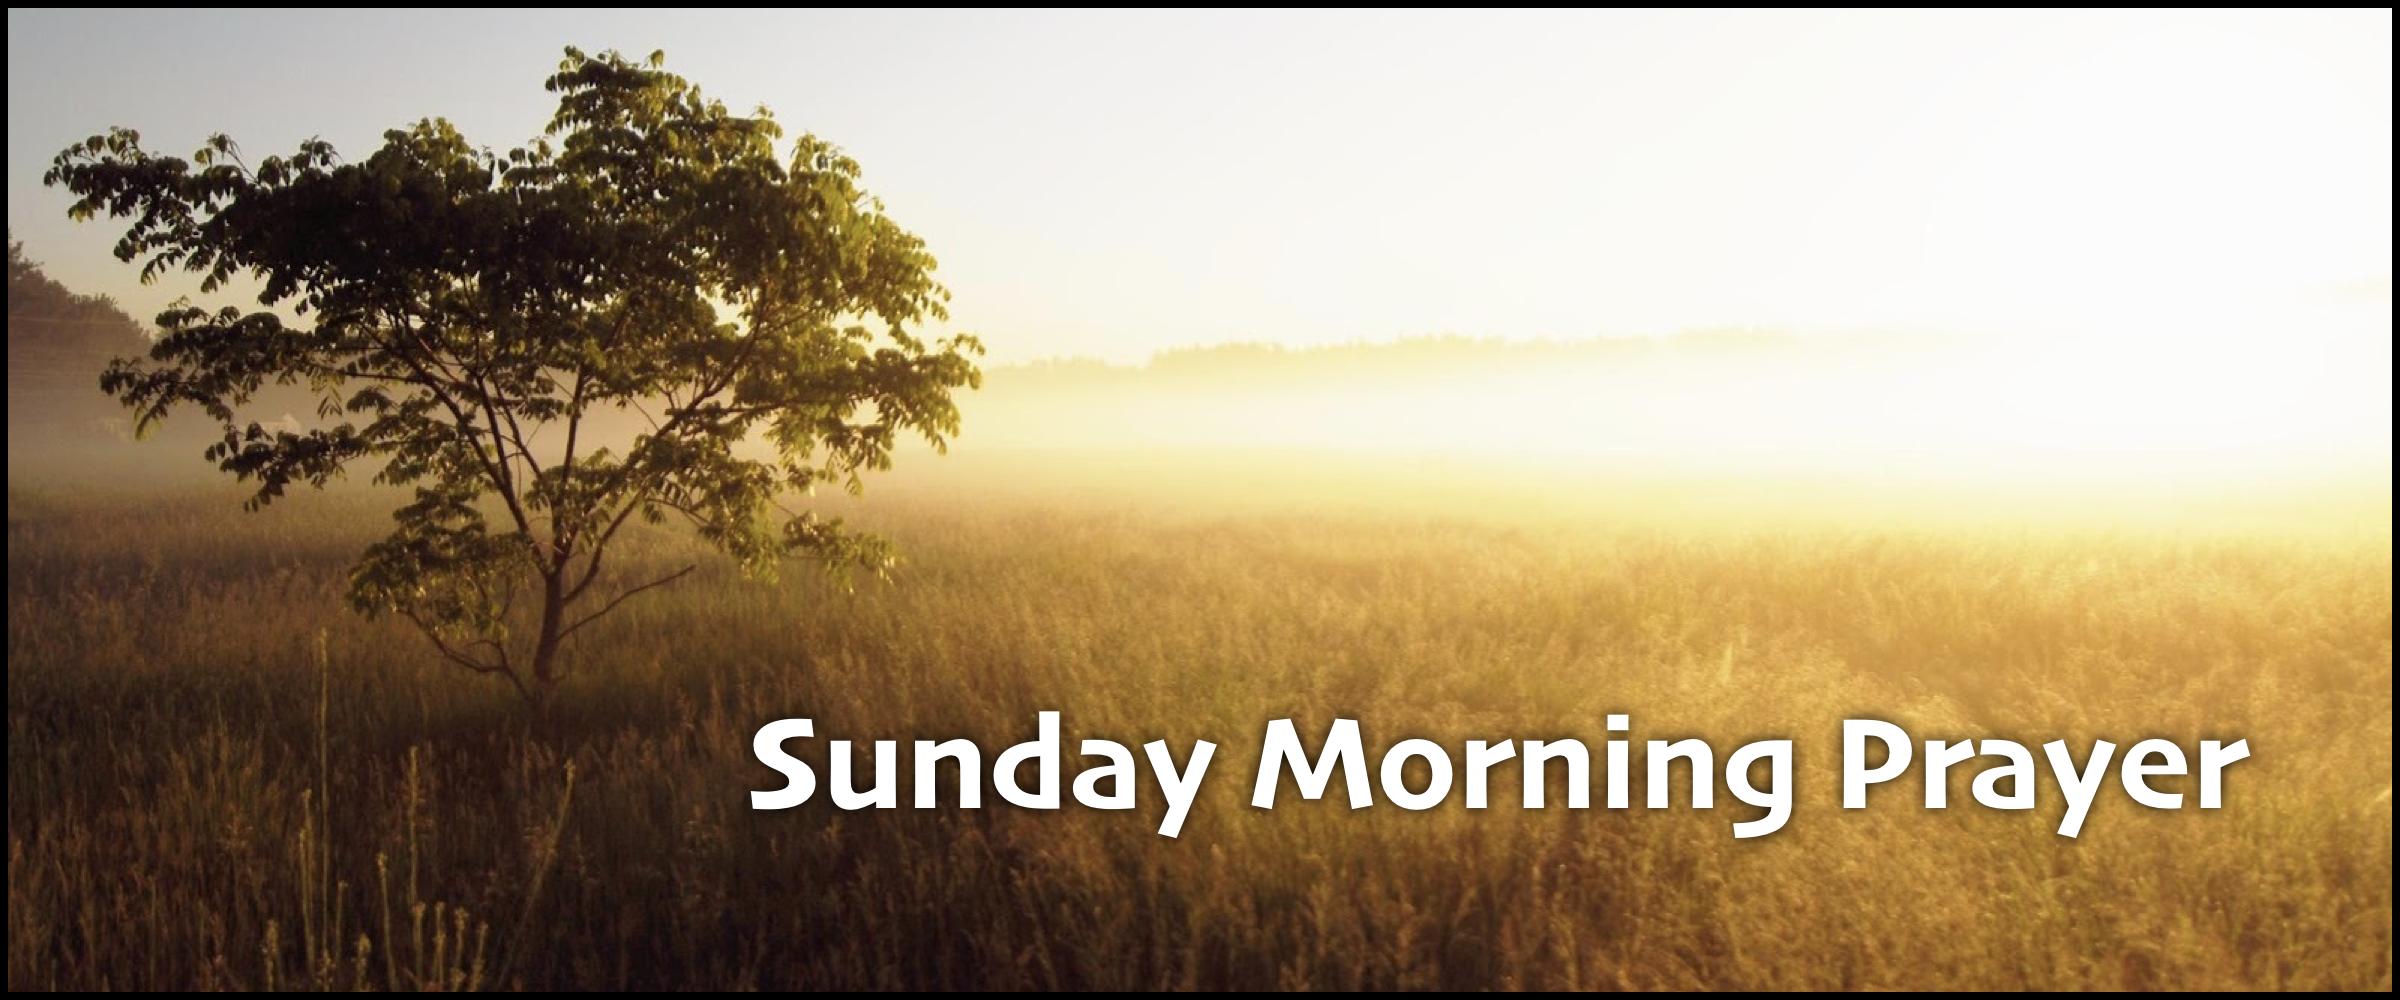 SUNDAY MORNING PRAYER (Event Thumbnail).001.png